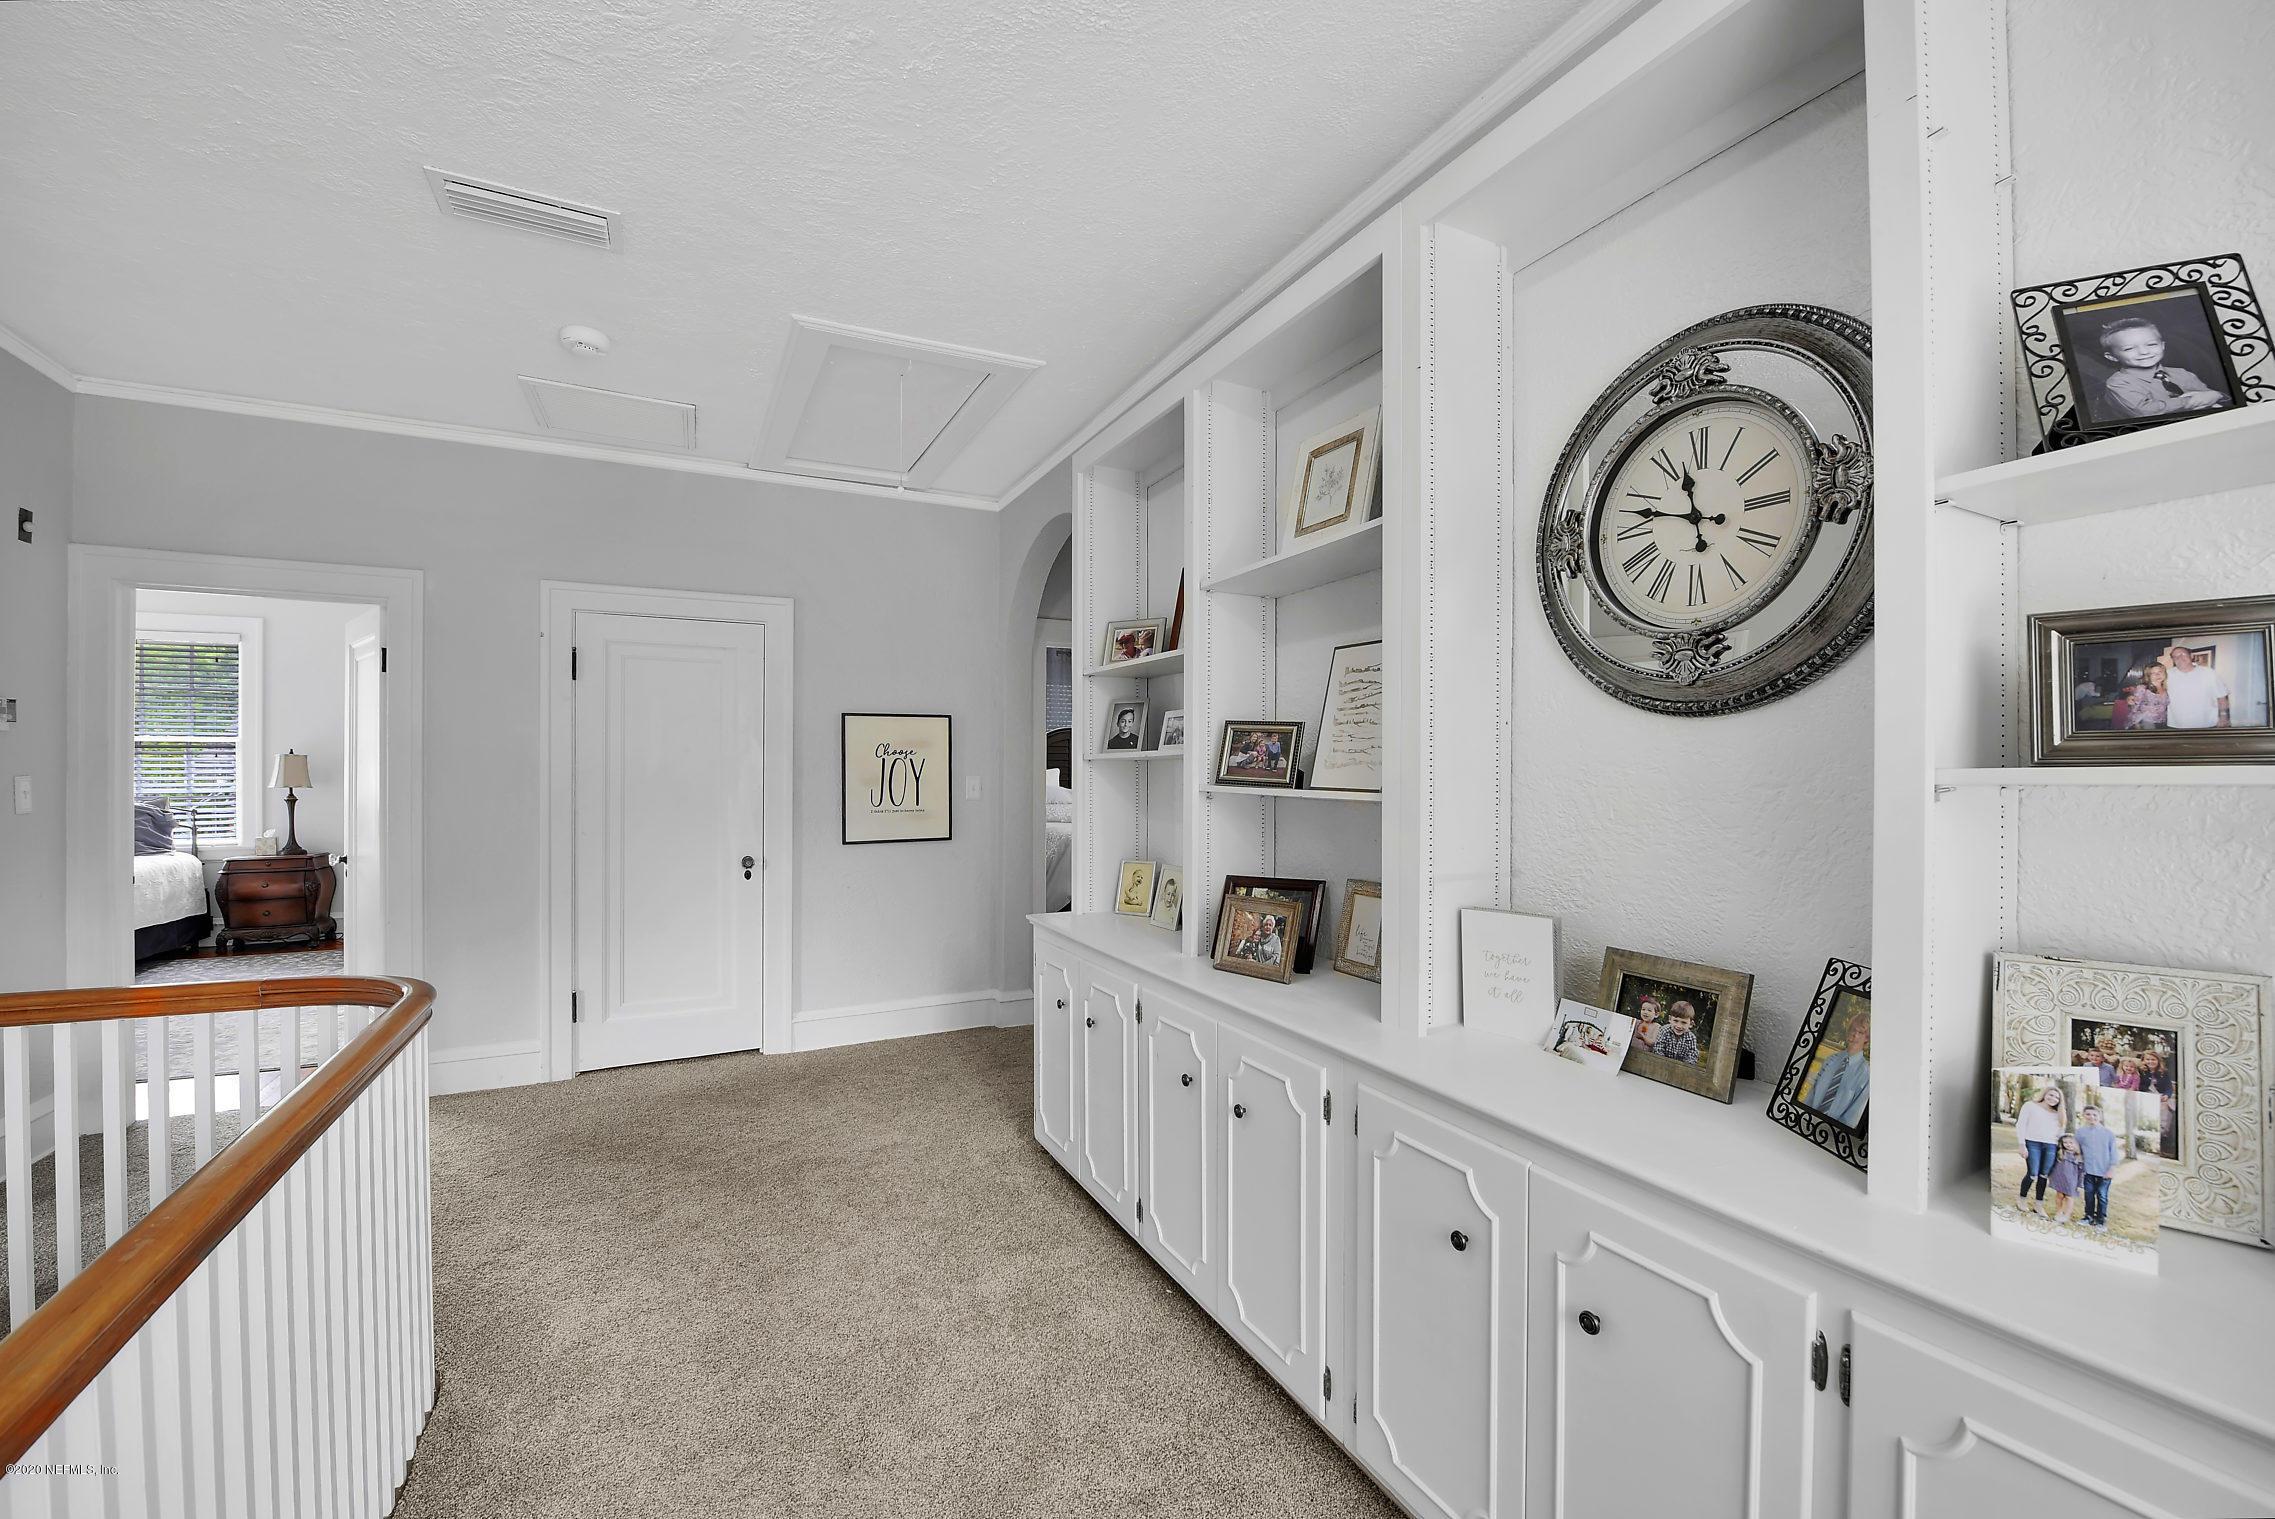 3534 RIVERSIDE, JACKSONVILLE, FLORIDA 32205, 4 Bedrooms Bedrooms, ,3 BathroomsBathrooms,Residential,For sale,RIVERSIDE,1055920